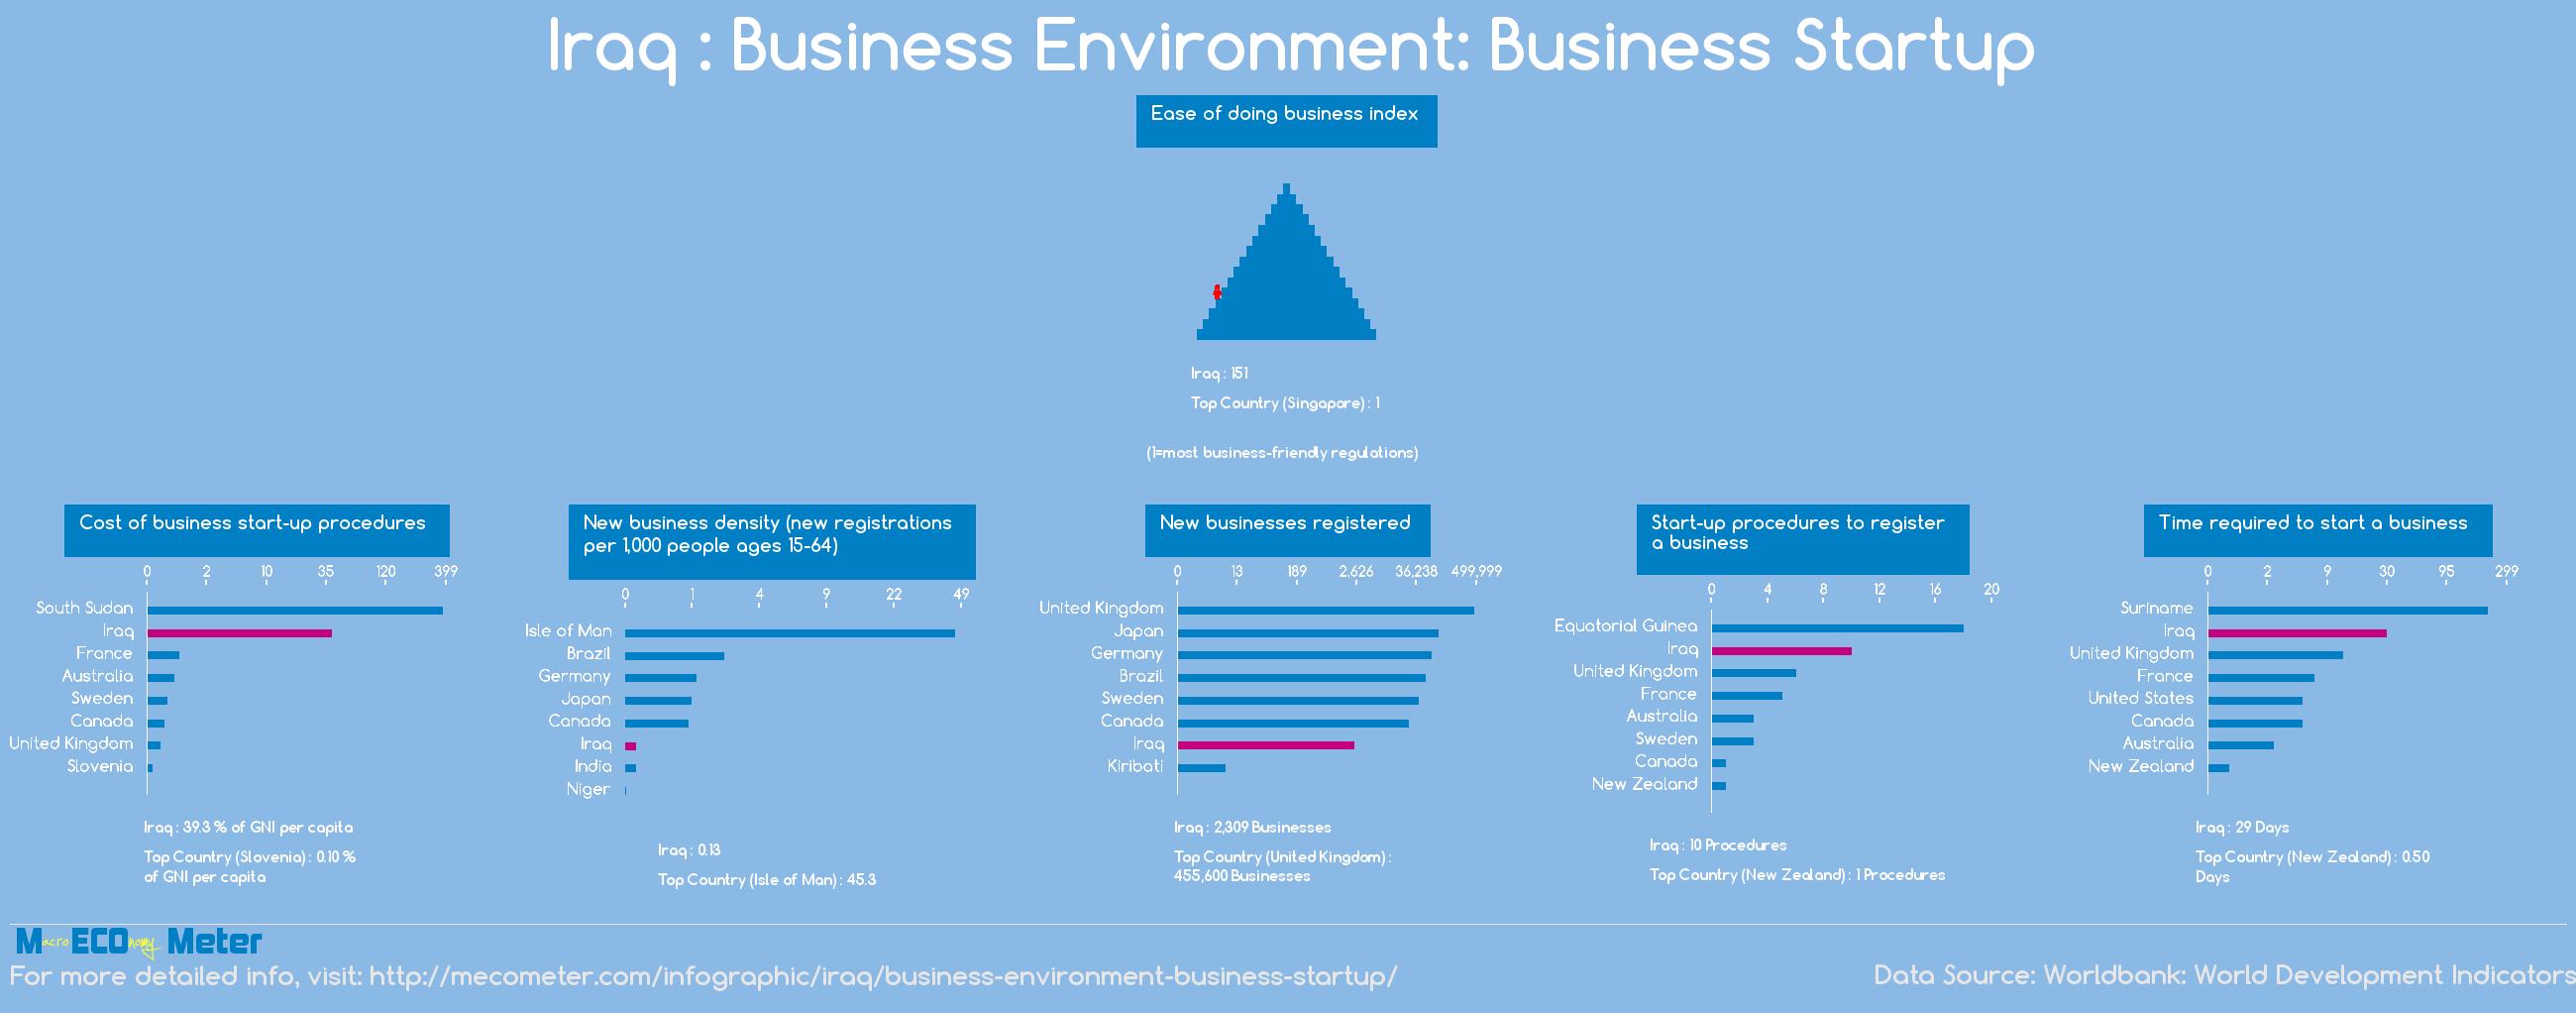 Iraq : Business Environment: Business Startup